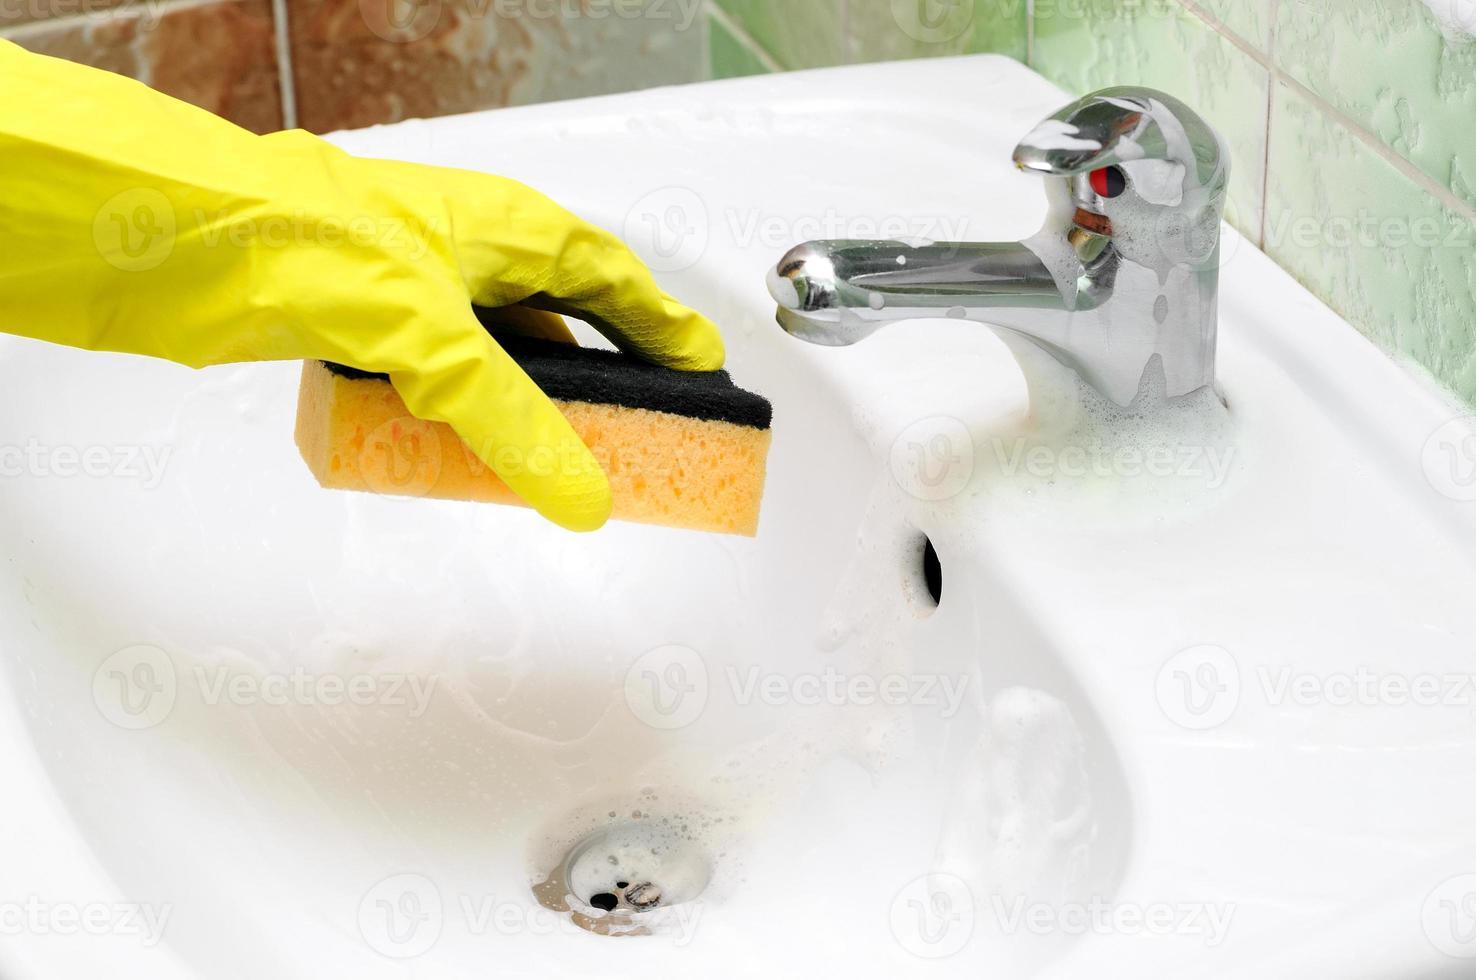 lavabo salle de bain robinet nettoyage photo